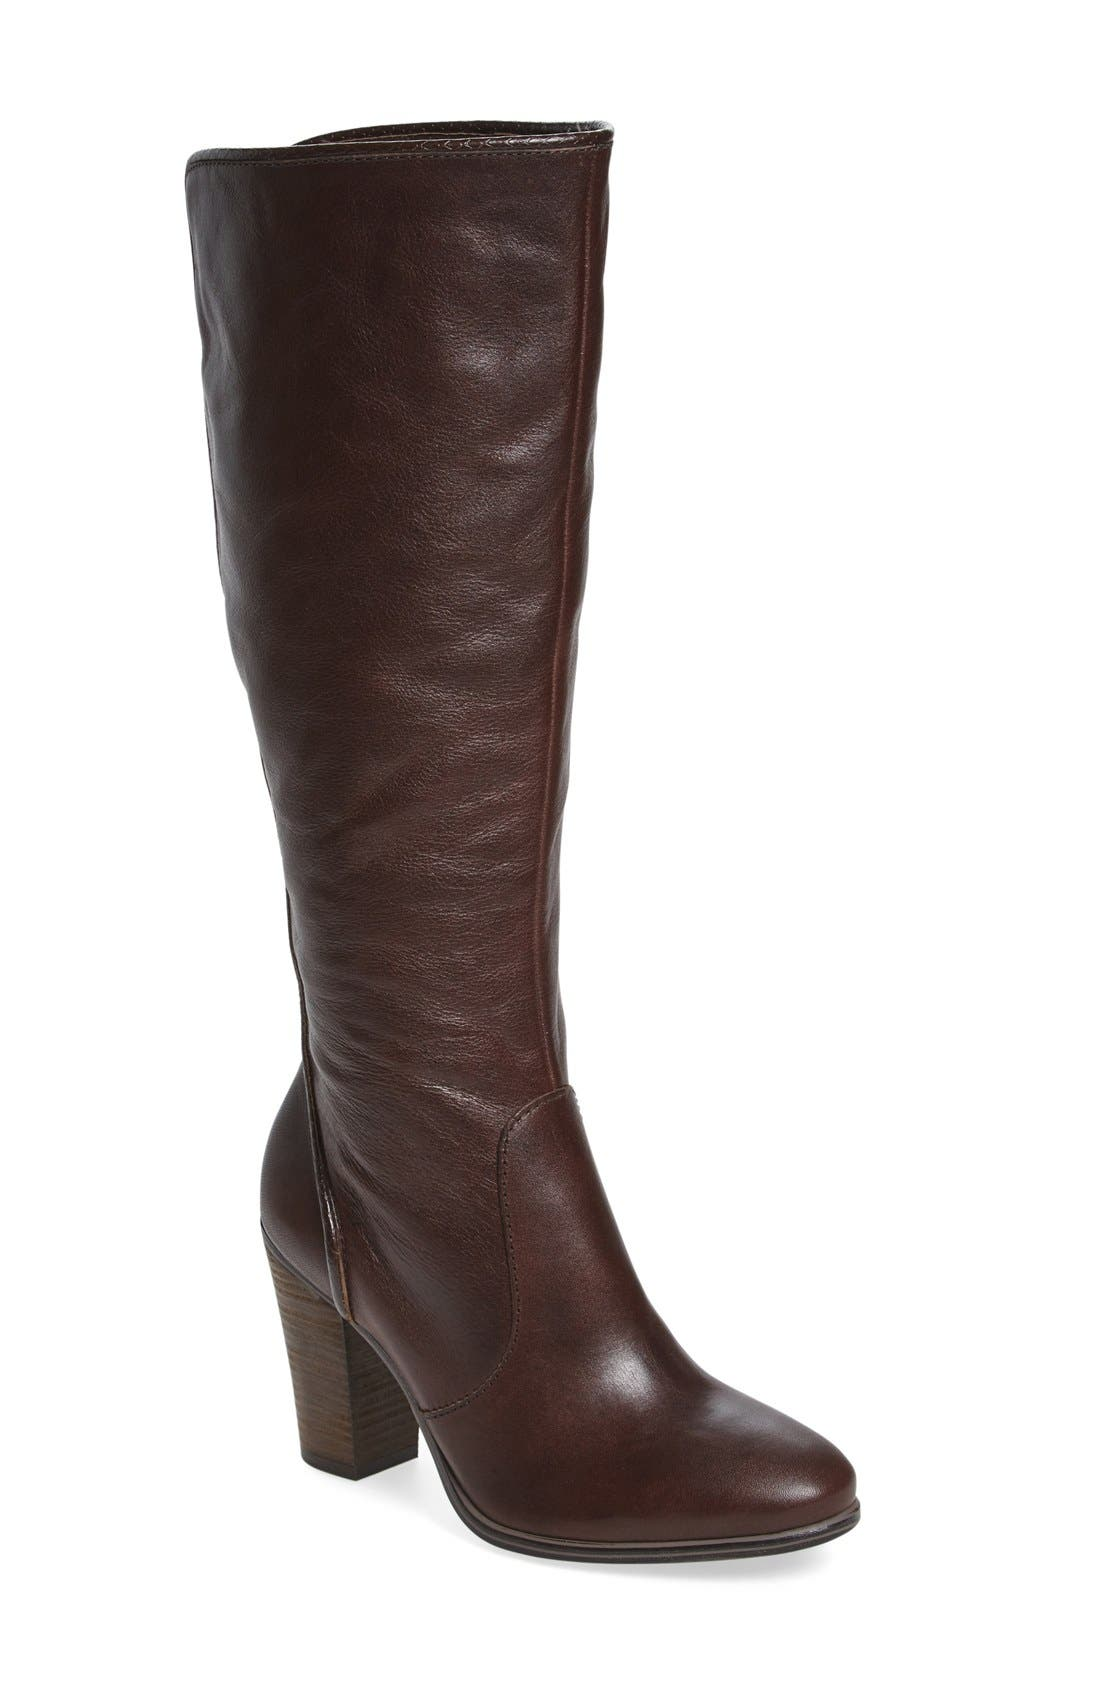 Alternate Image 1 Selected - Vince Camuto Framina Knee High Boot (Women)